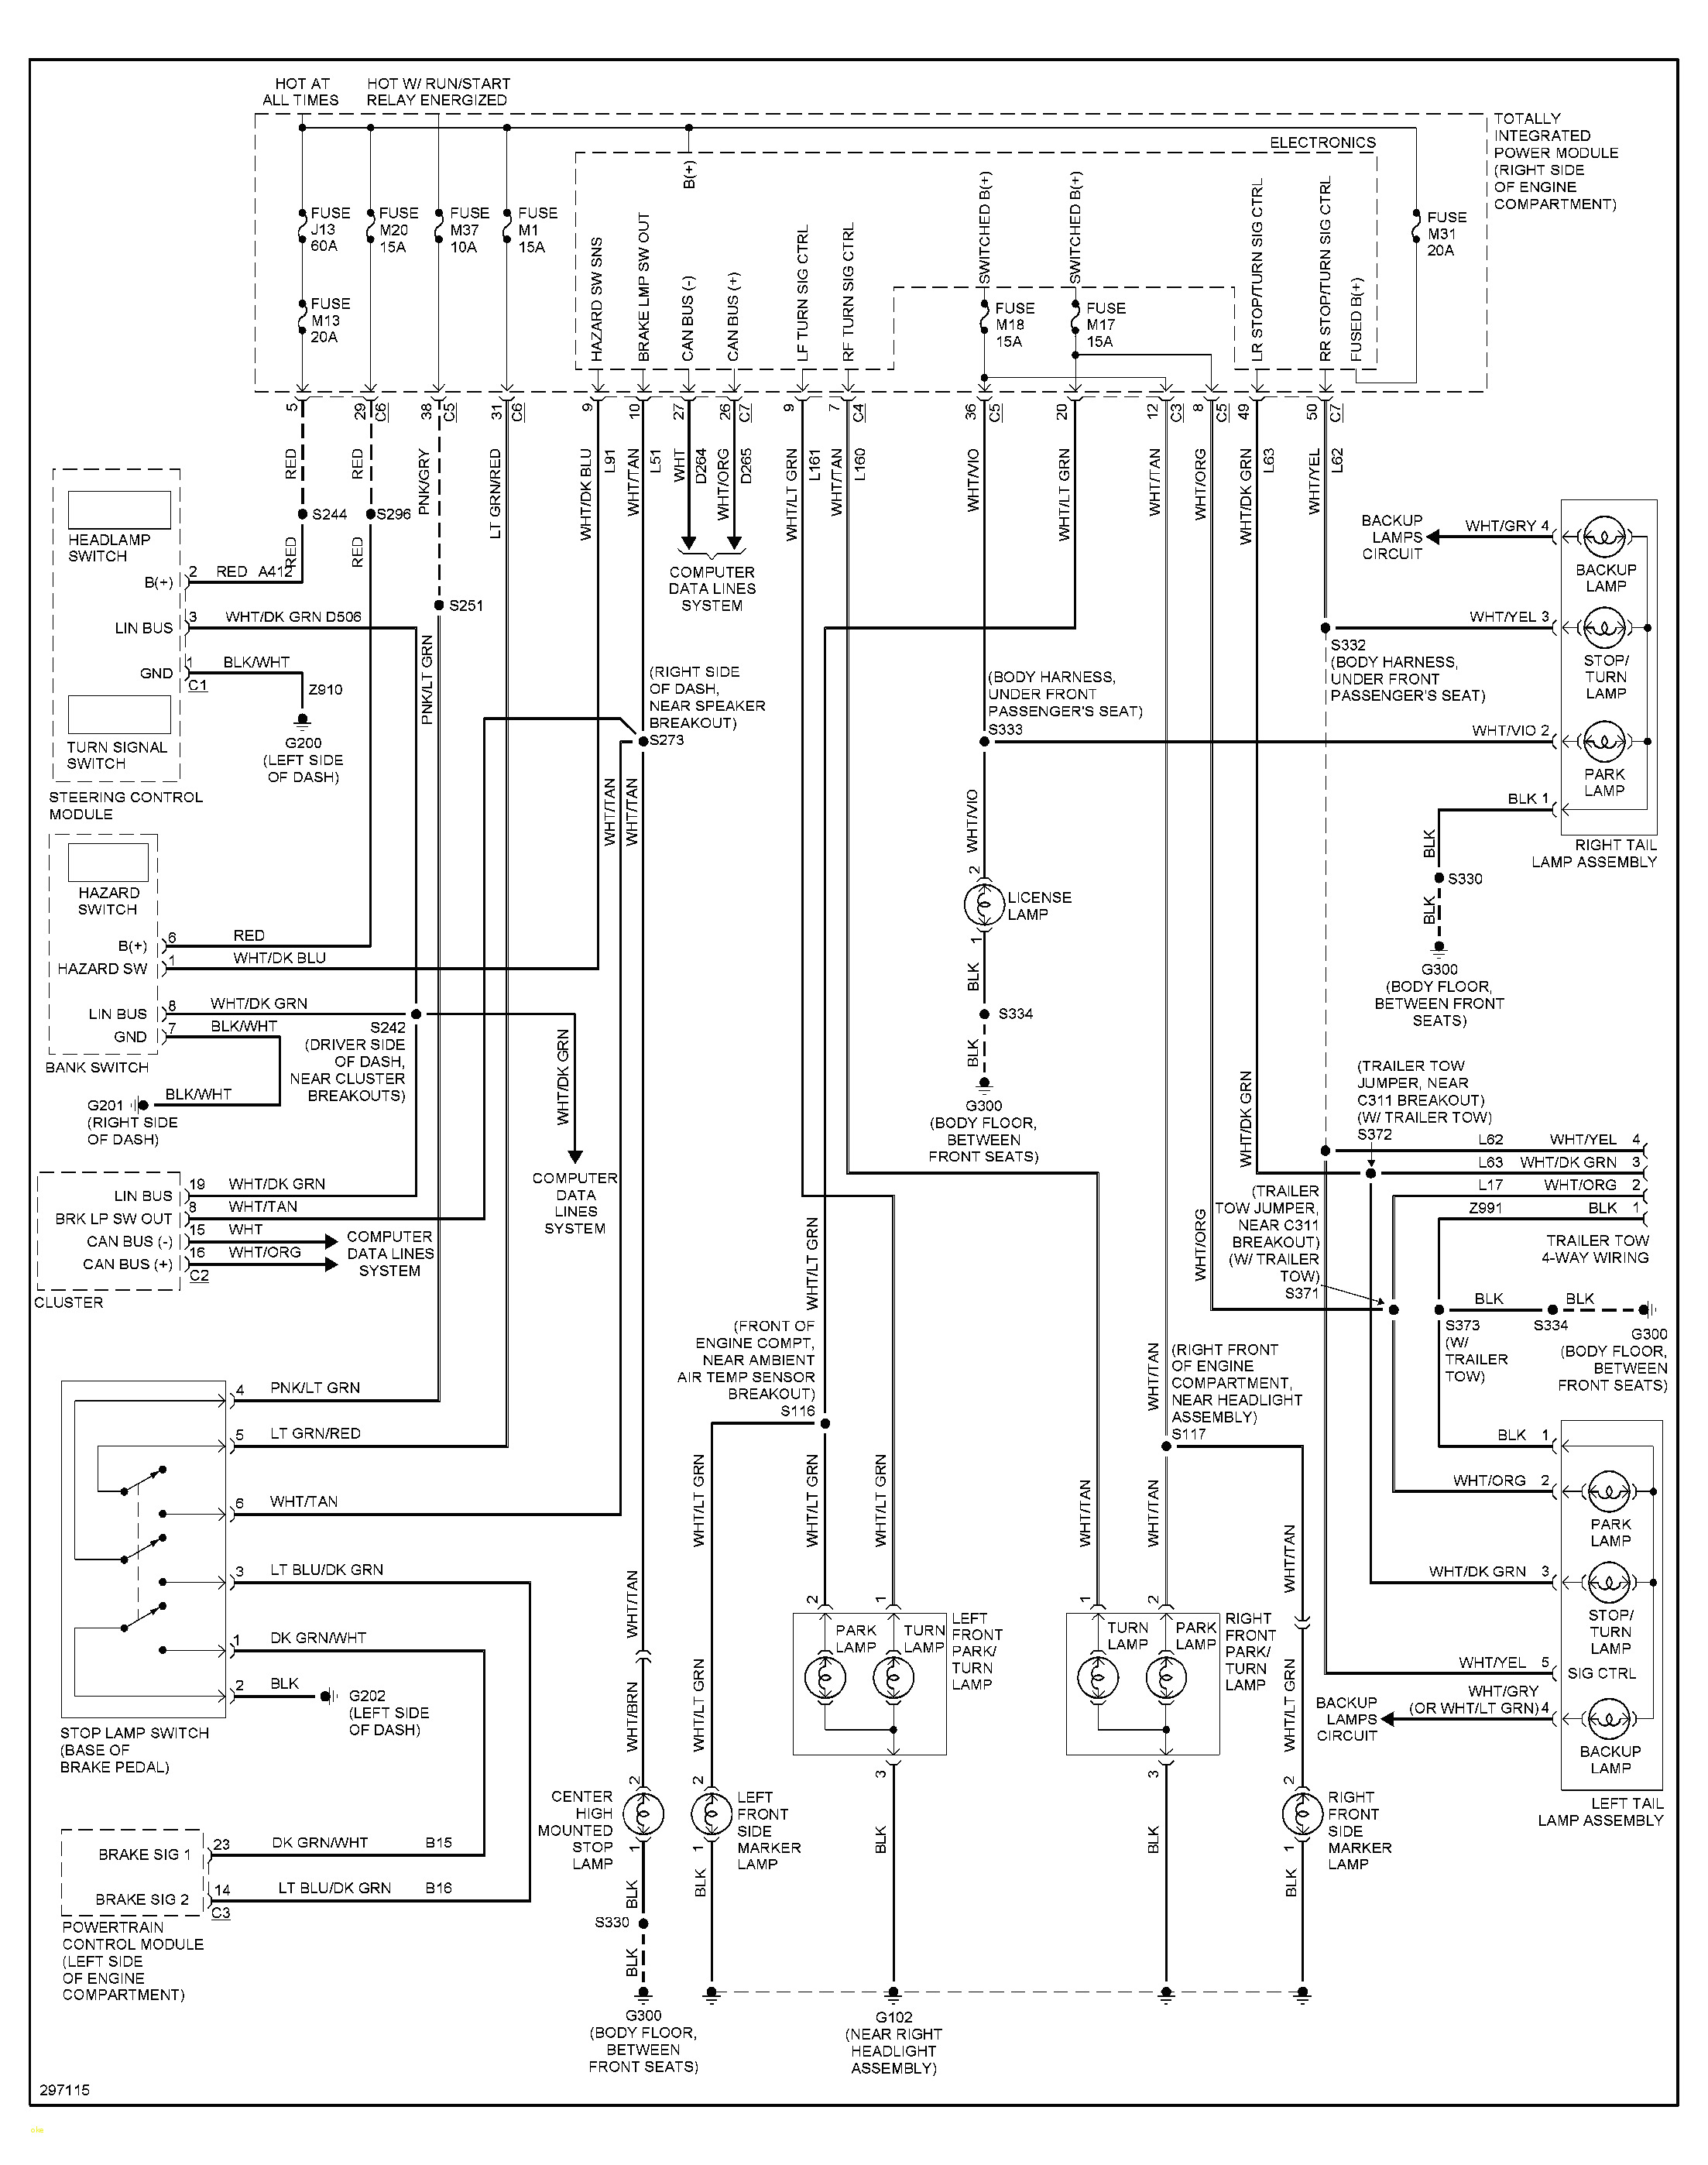 2004 Jeep Grand Cherokee Wiring Harness Diagram - Today Wiring Diagram - 2004 Jeep Grand Cherokee Door Wiring Harness Diagram